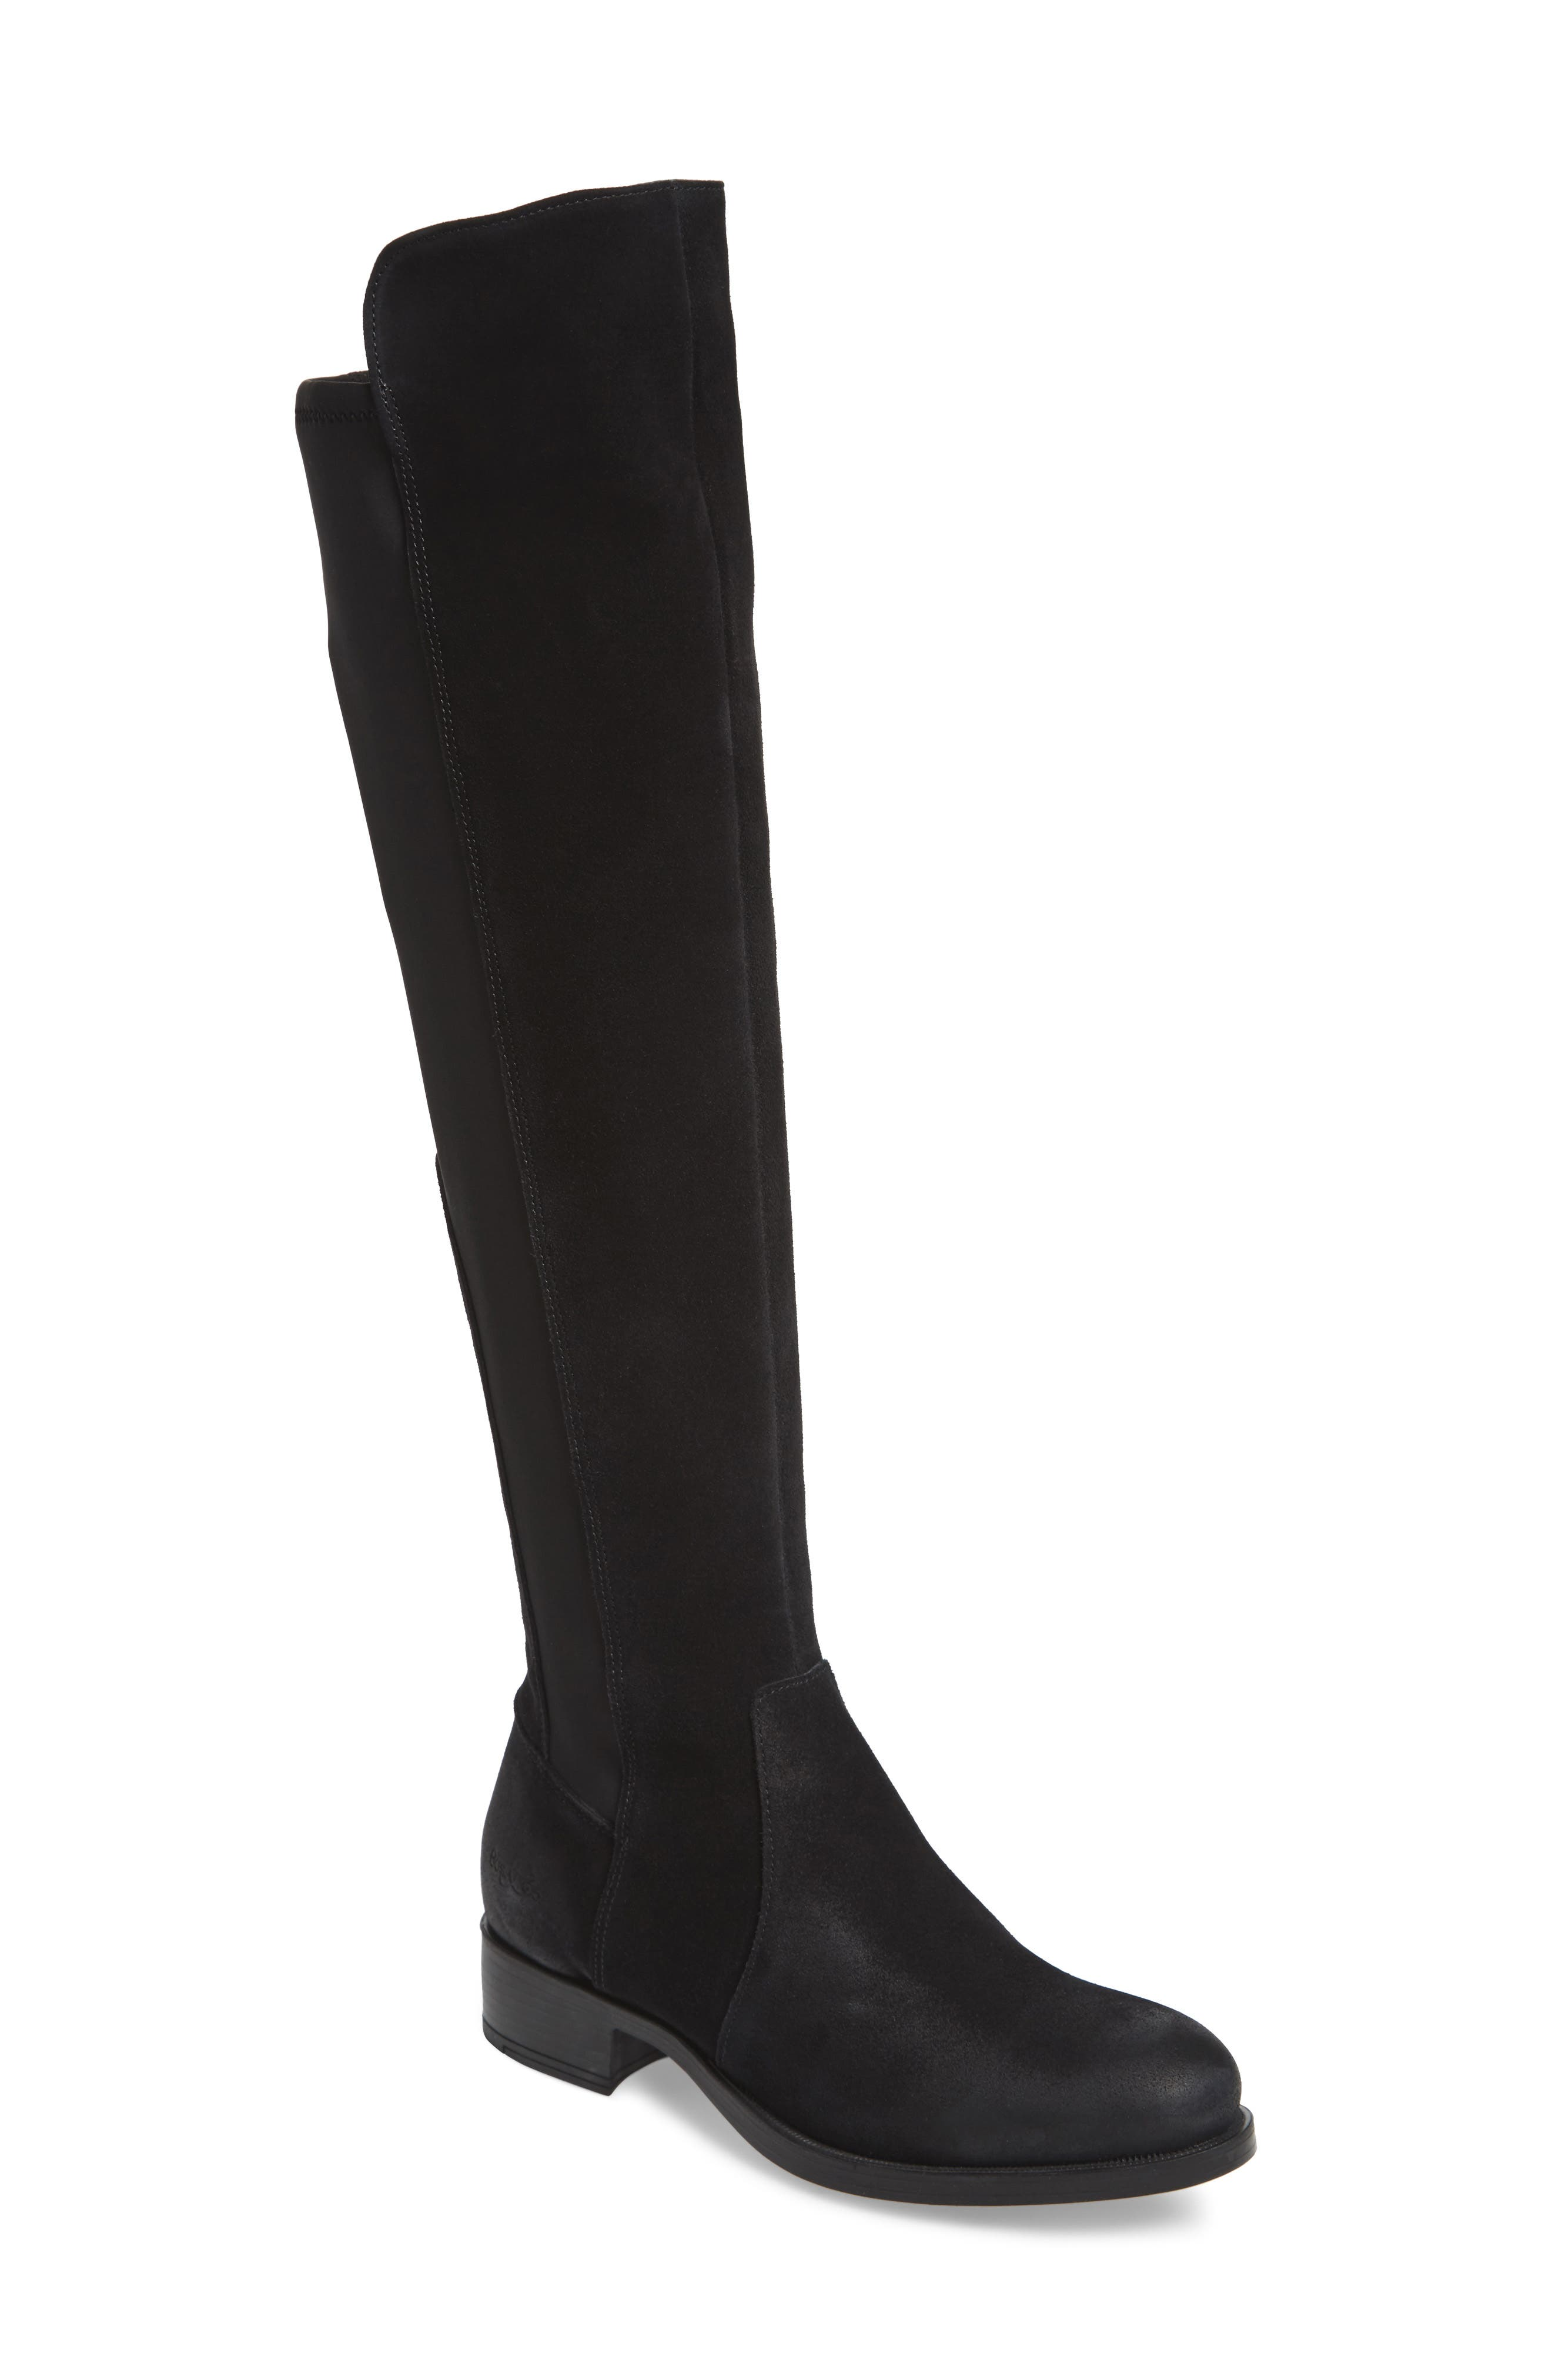 Main Image - Bos. & Co. Bunt Waterproof Over the Knee Boot (Women)